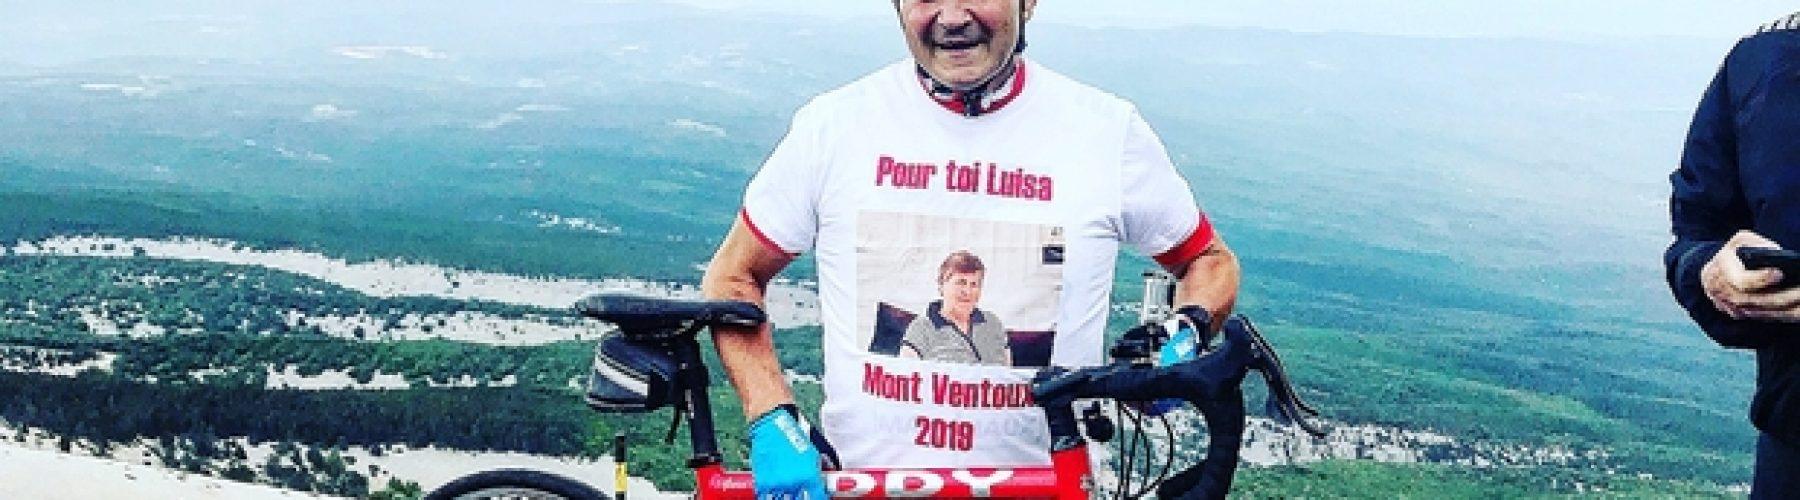 Maurice-mont-ventoux